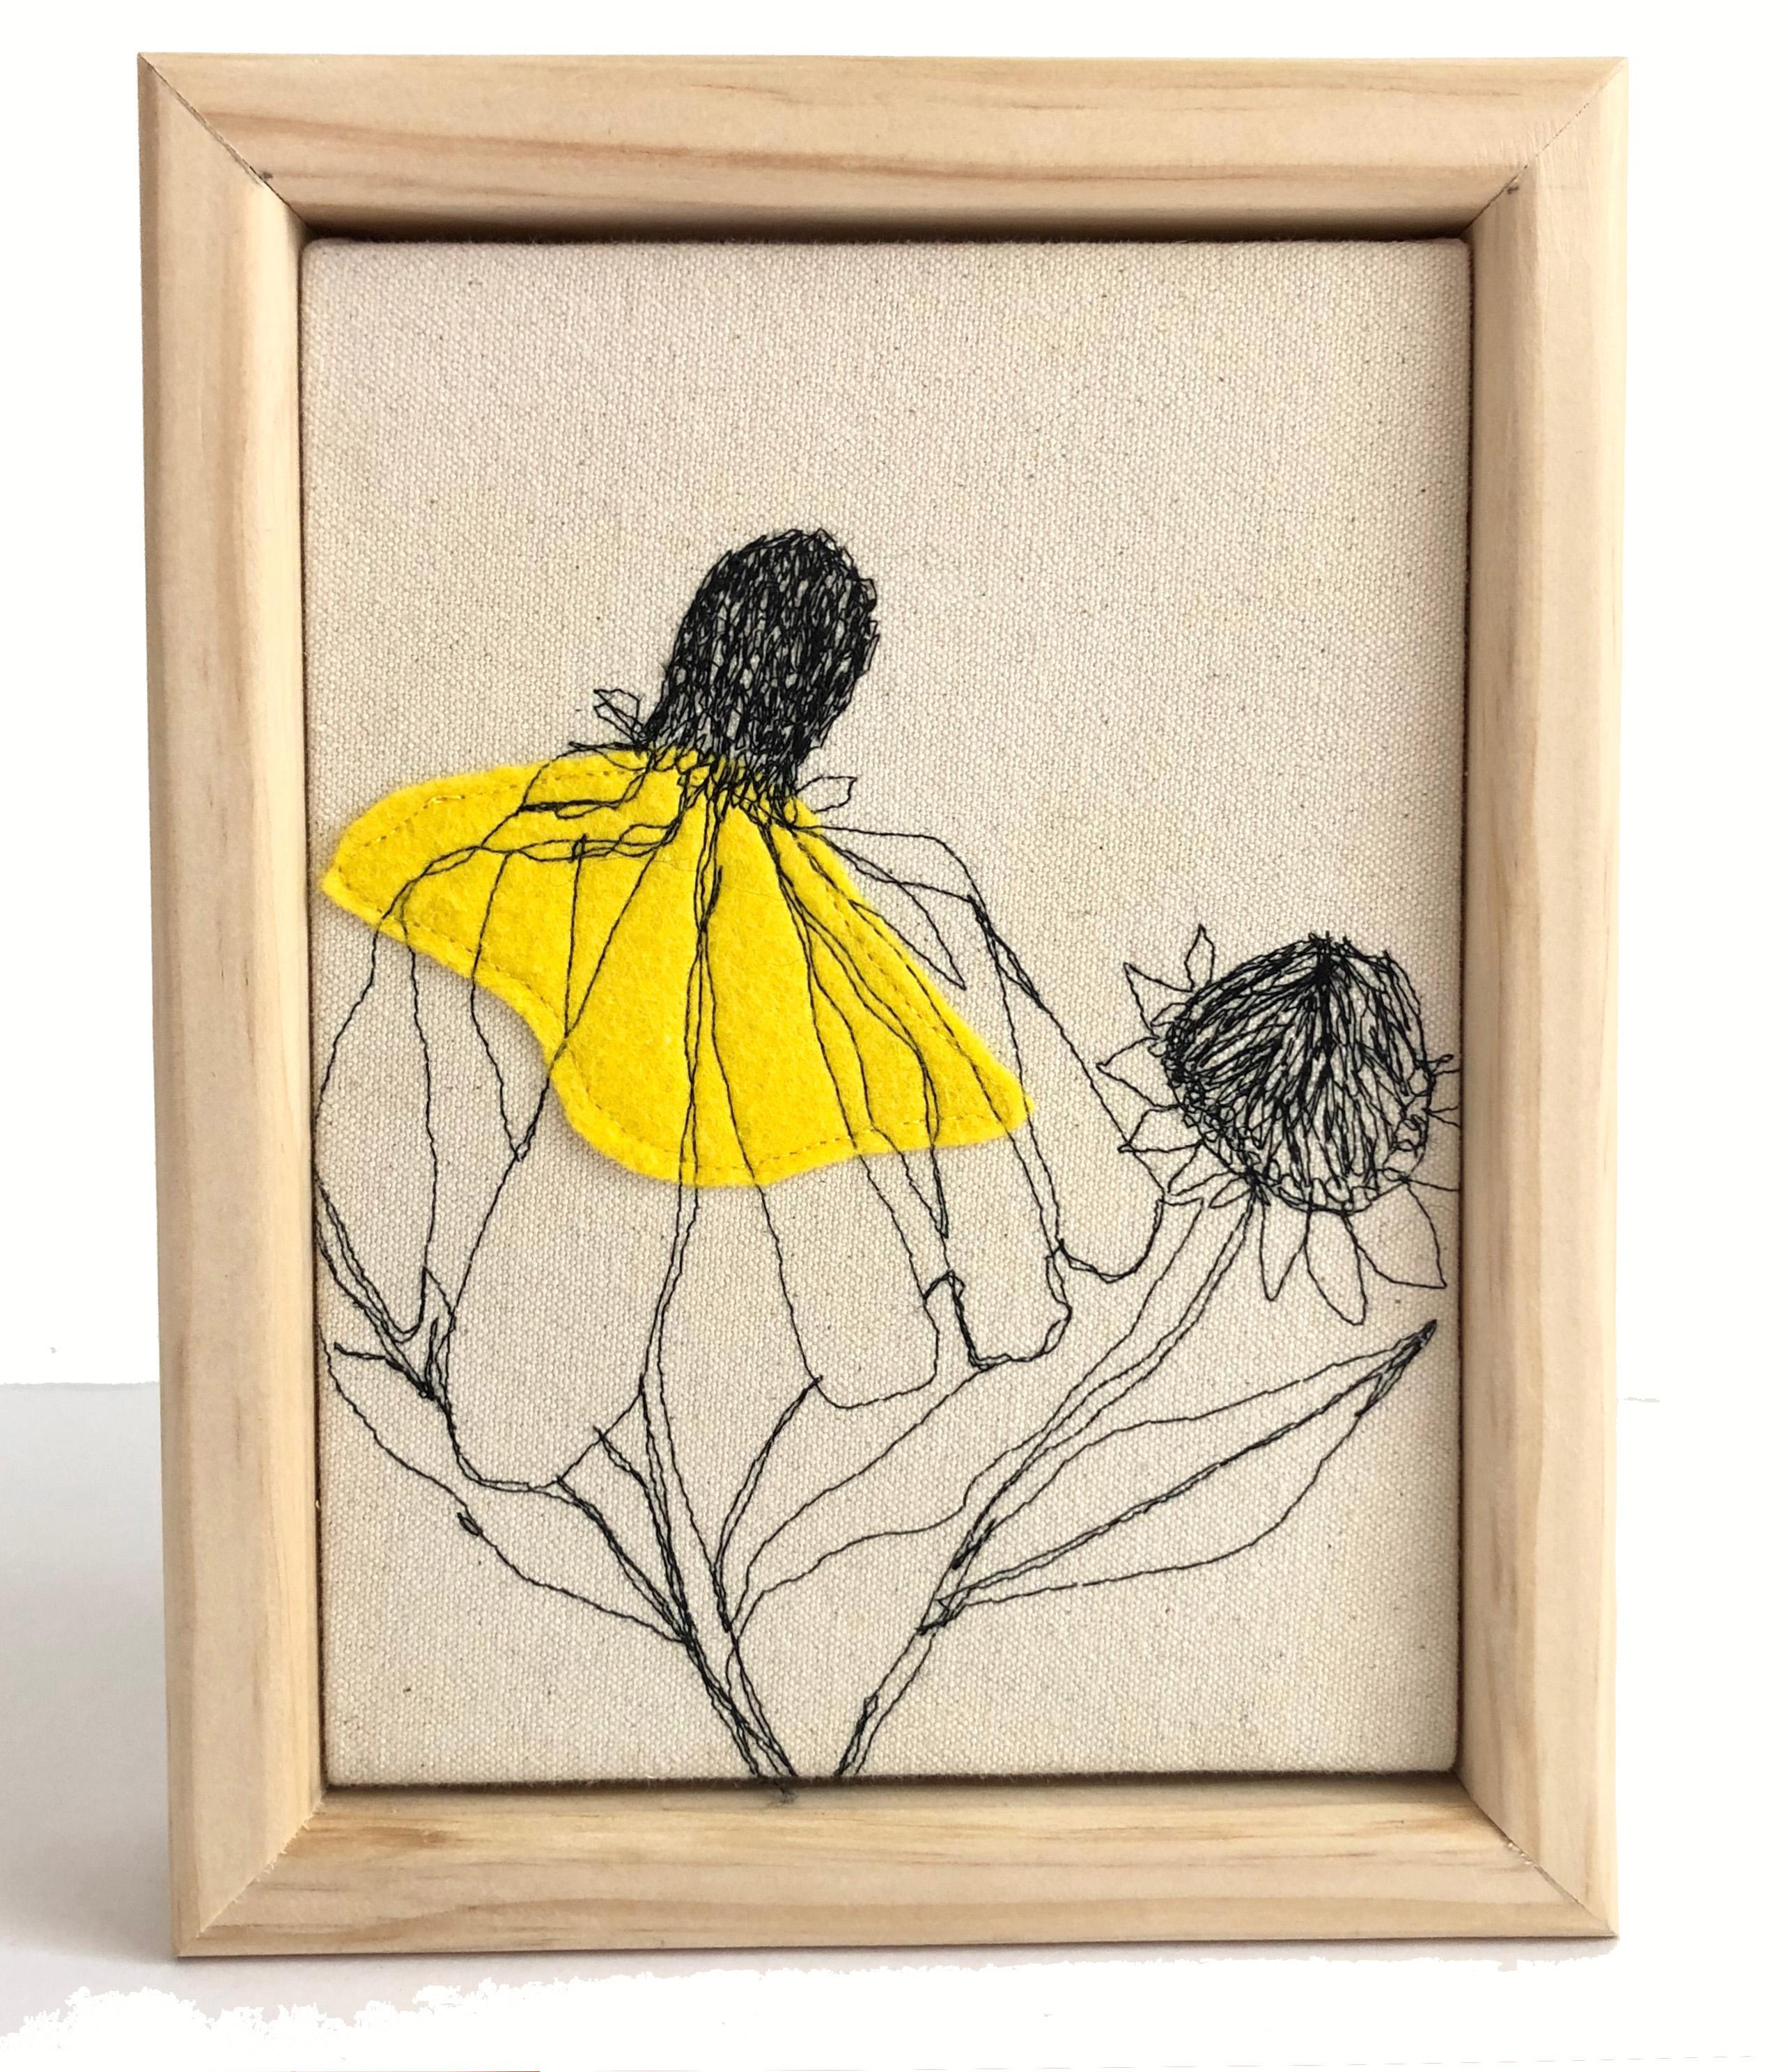 fiberart, thread drawing, nature, plants